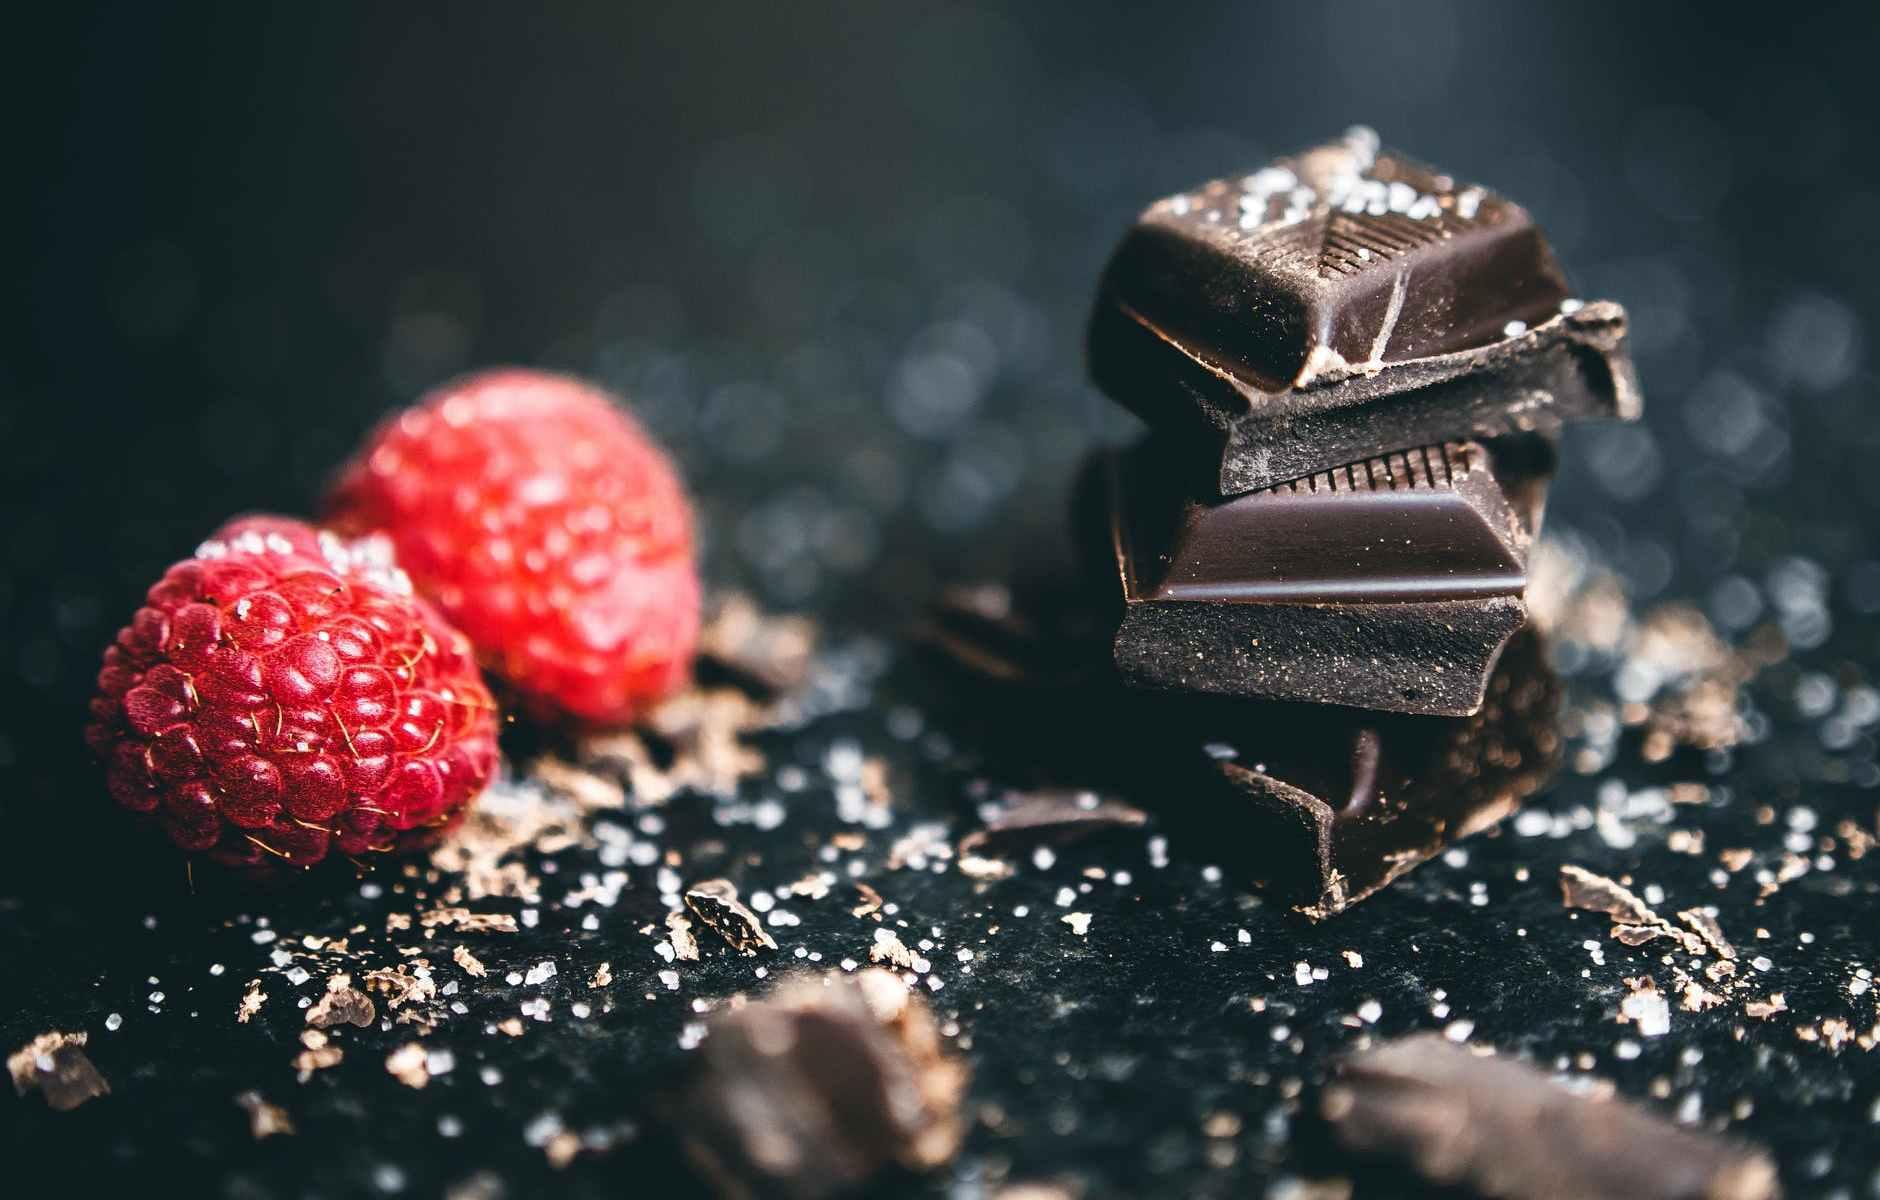 close up photo of stacked chocolates bars beside raspberries